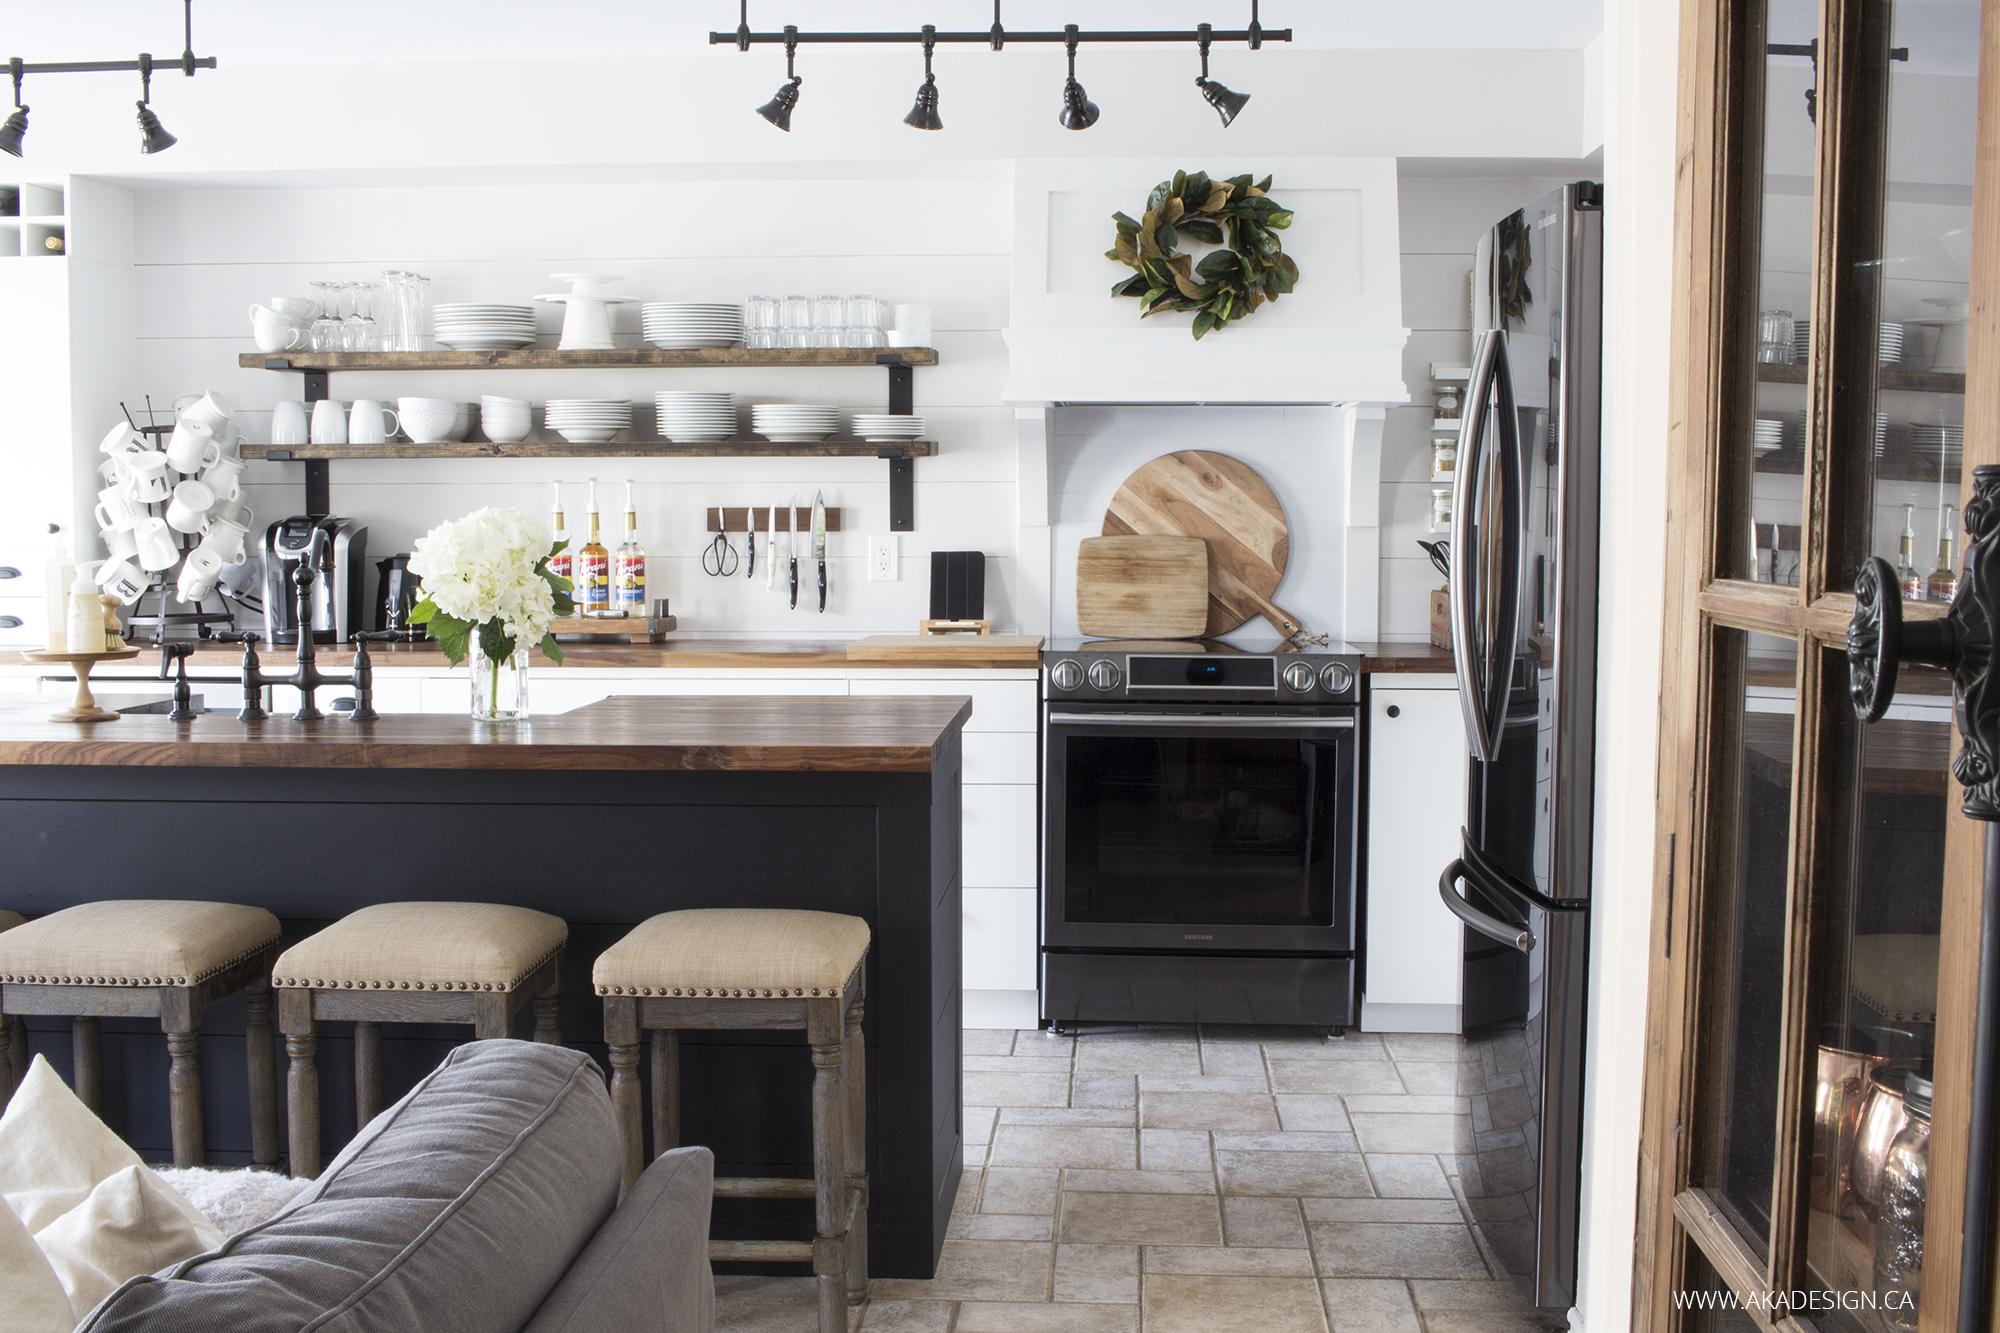 Fullsize Of Gray And White Kitchen